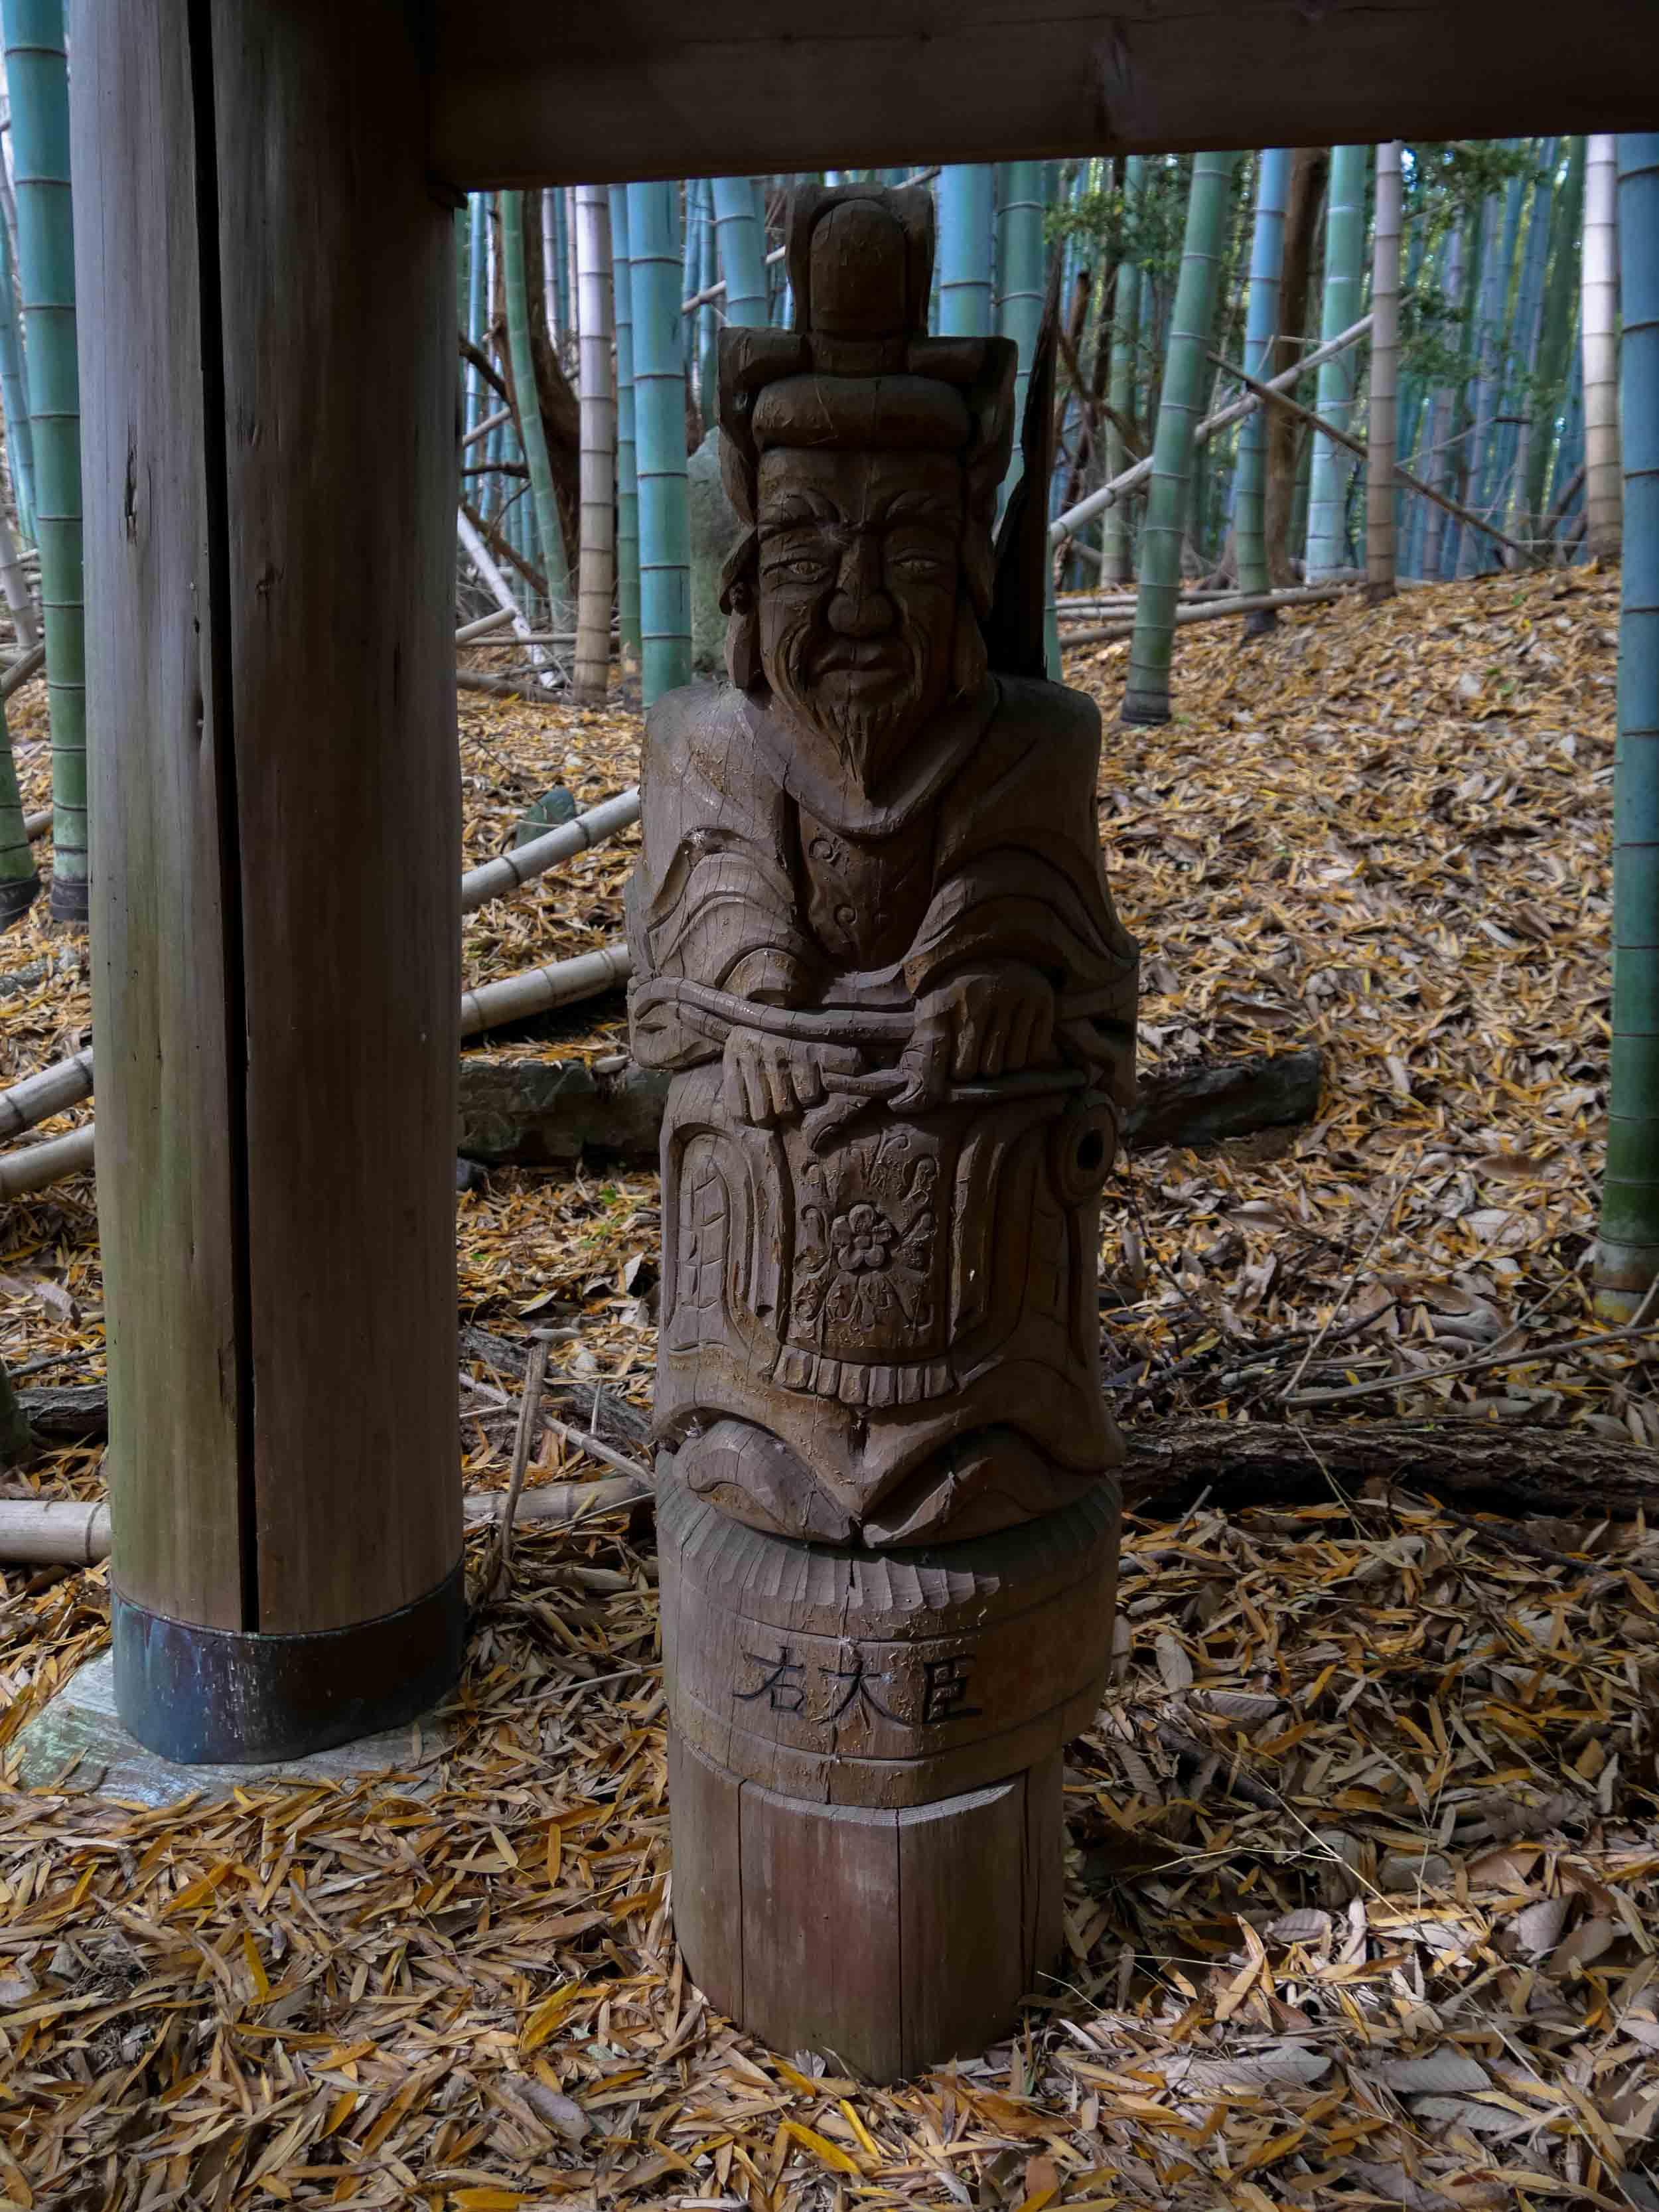 matsuyama-dougo-onsen-33.jpg